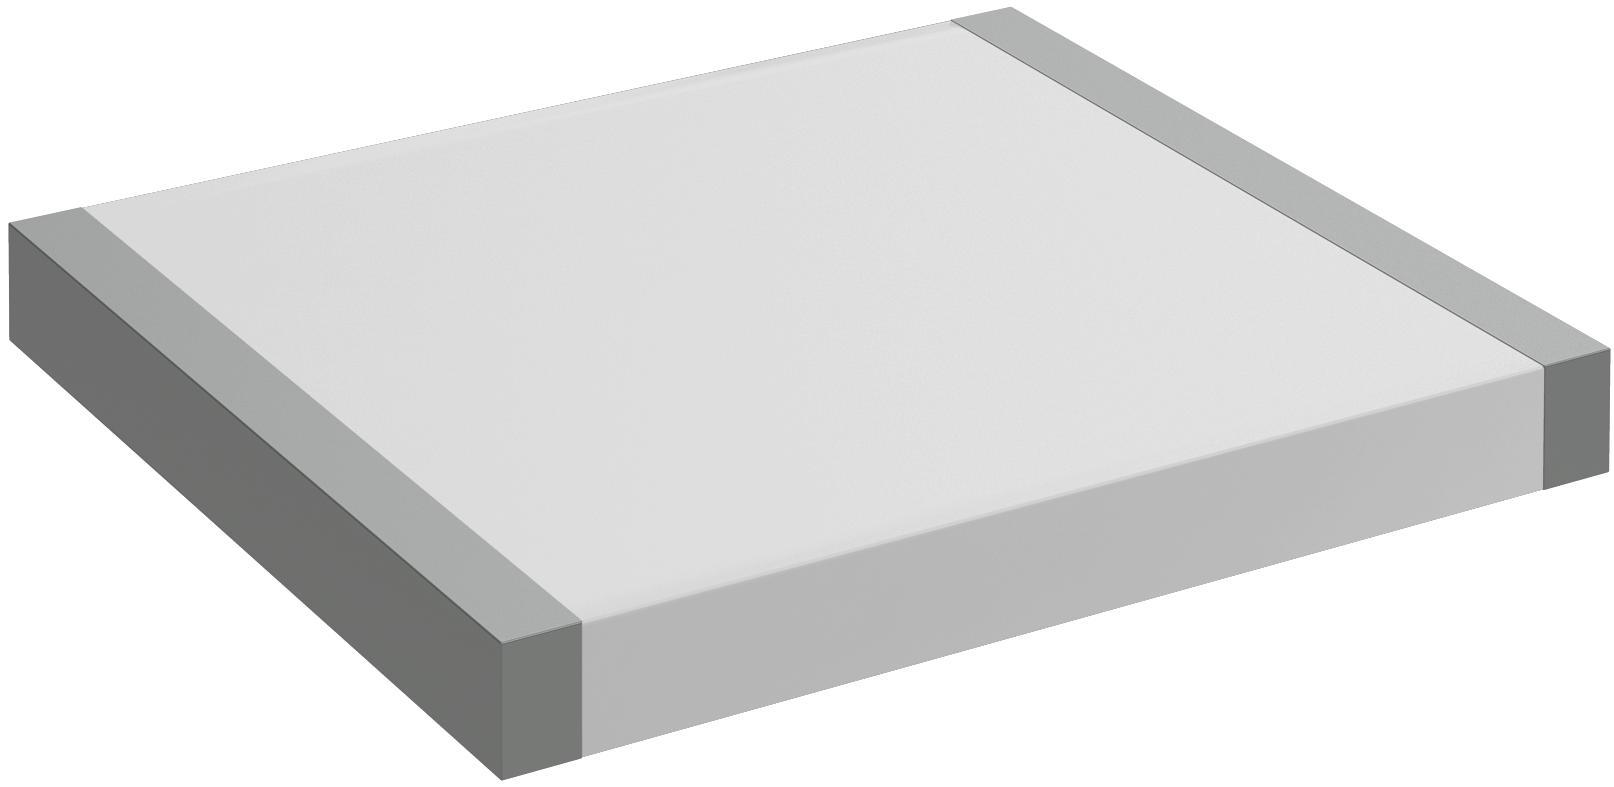 Панель Jacob delafon Eb508-bme parallel